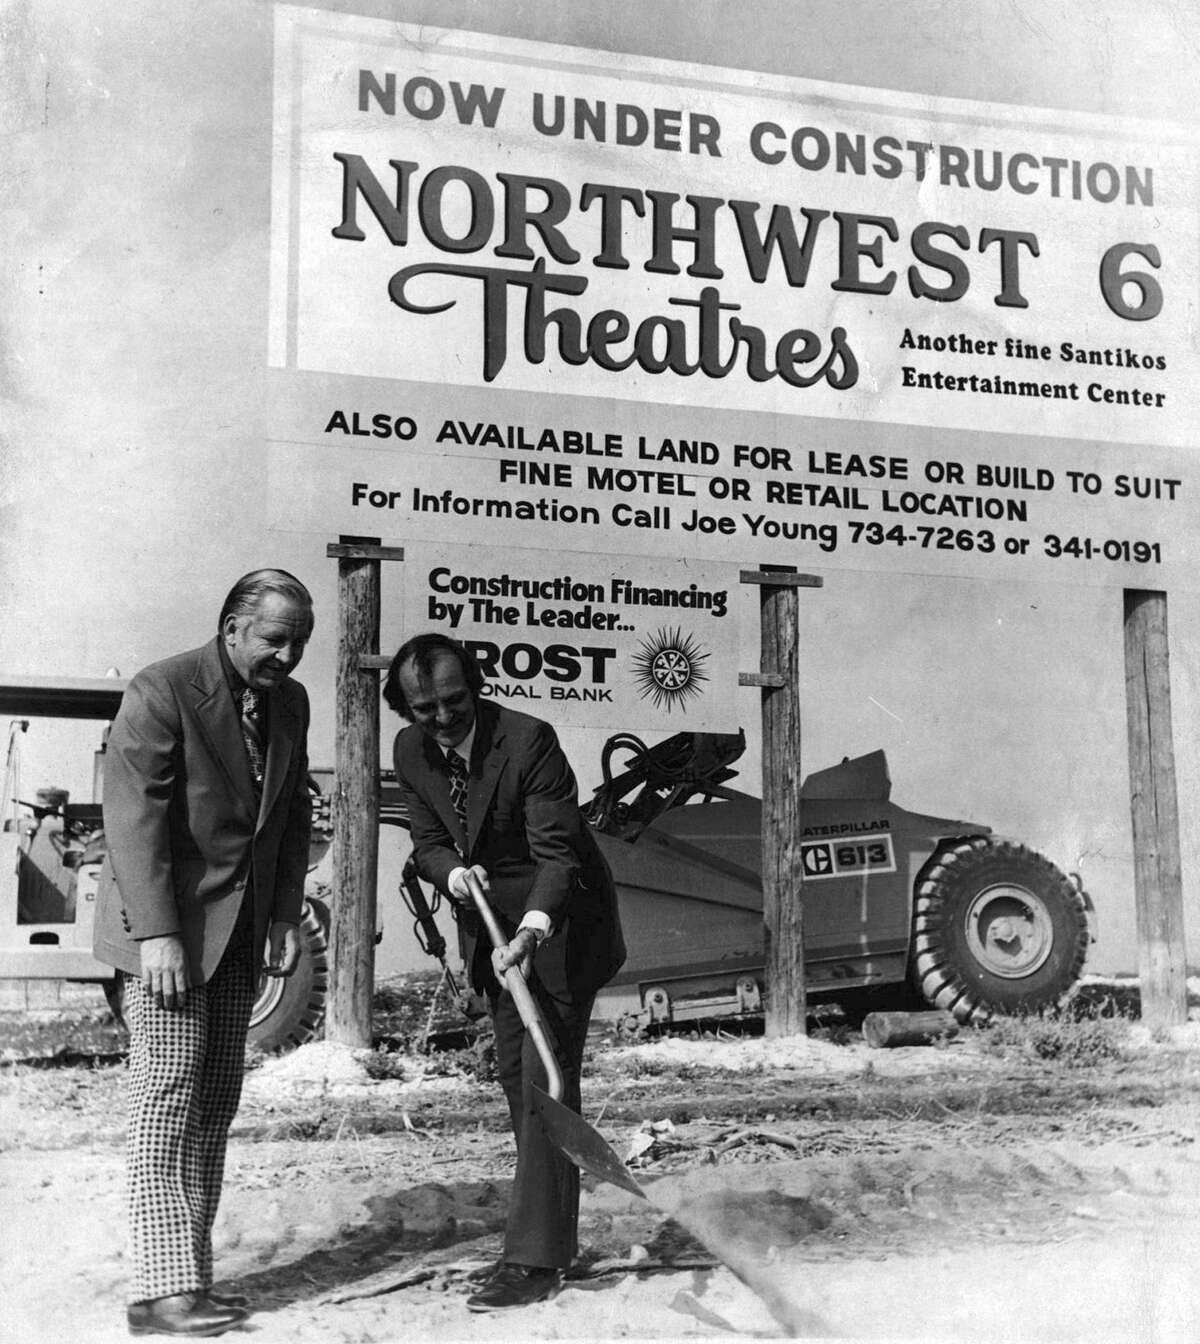 Former city councilman Glen Hartman (left) watches as John Santikos breaks ground for Northwest Six Theatres in 1976.